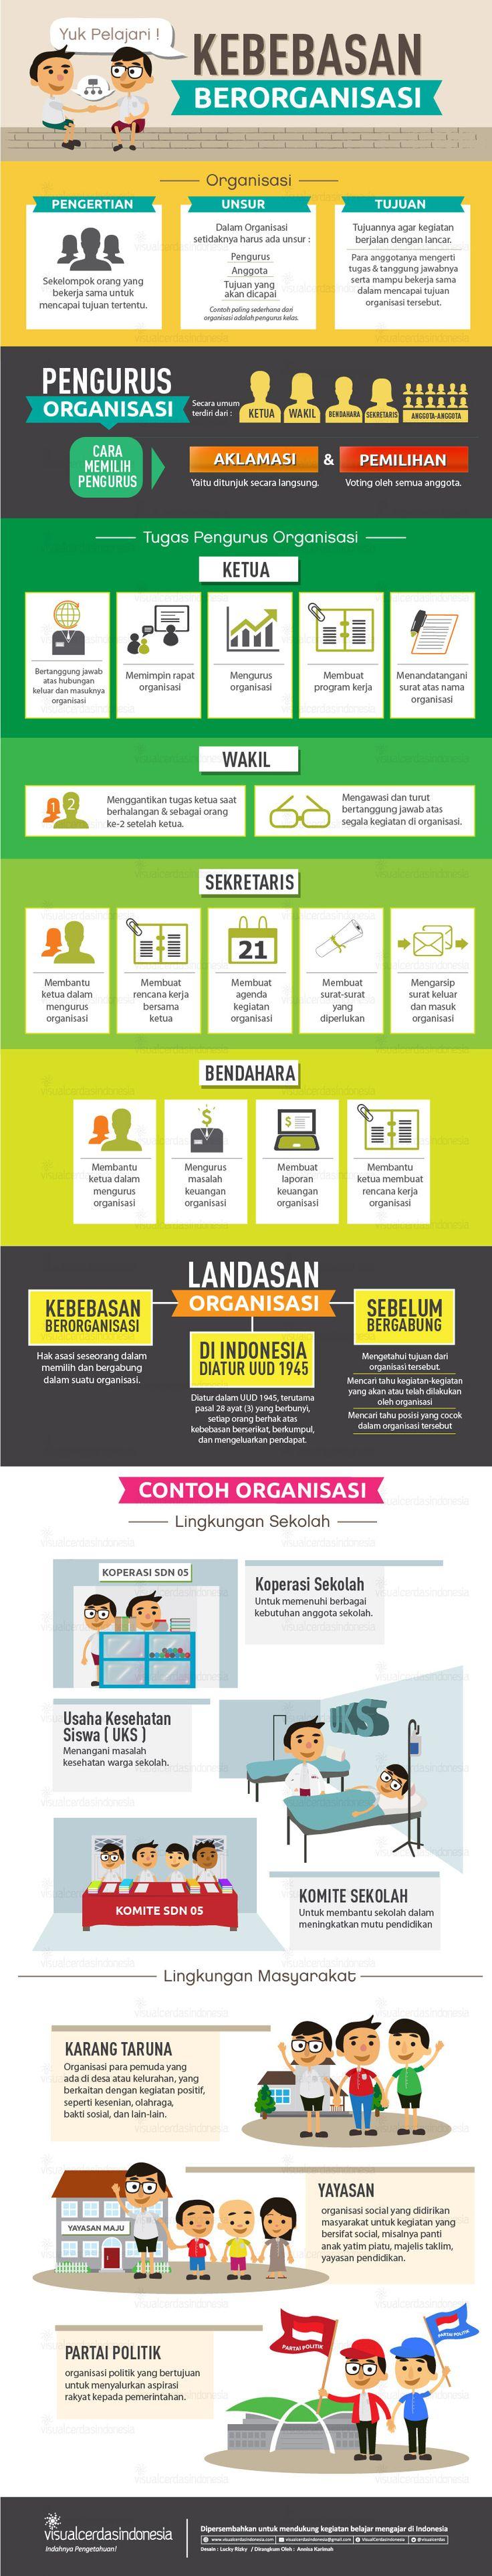 Edugrafis: Kebebasan Berorganisasi - Visual Cerdas Indonesia